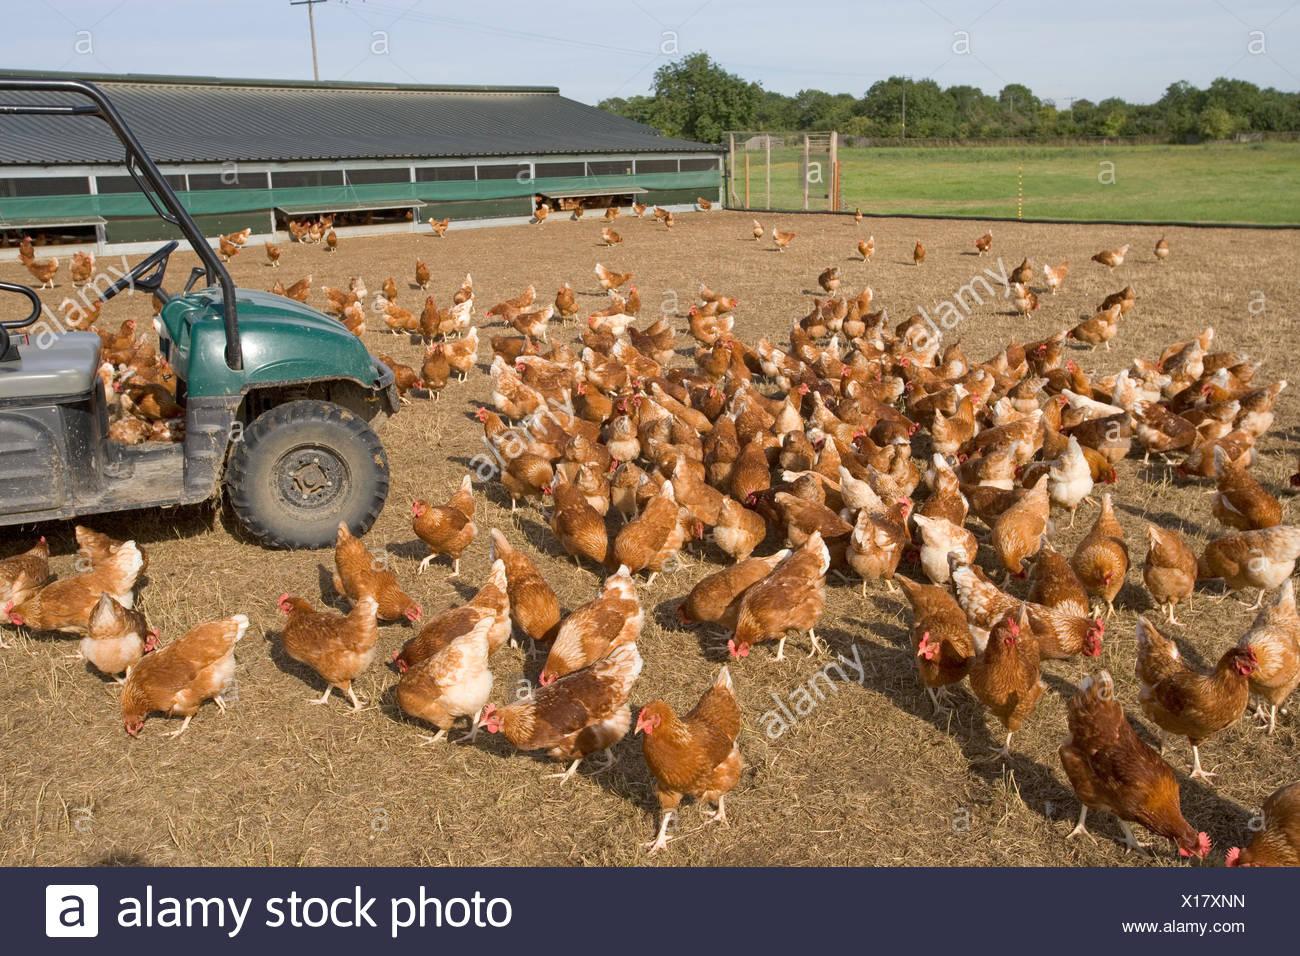 Organic free range hens - Stock Image